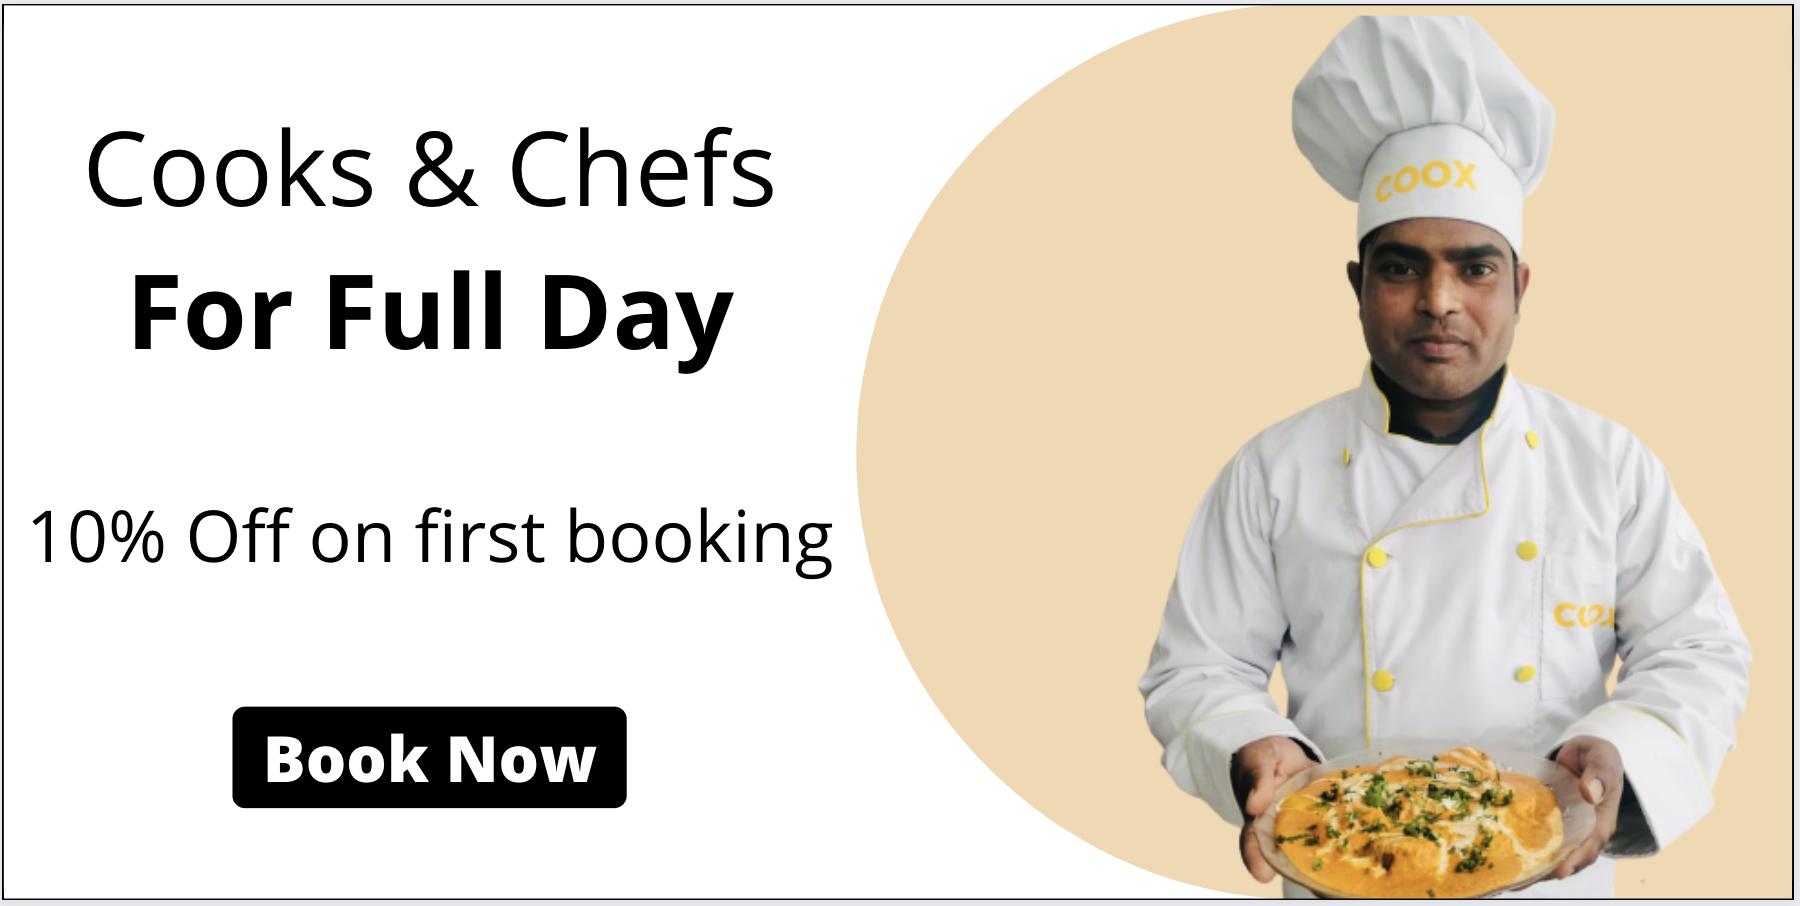 Cooks & Chefs for Full Day